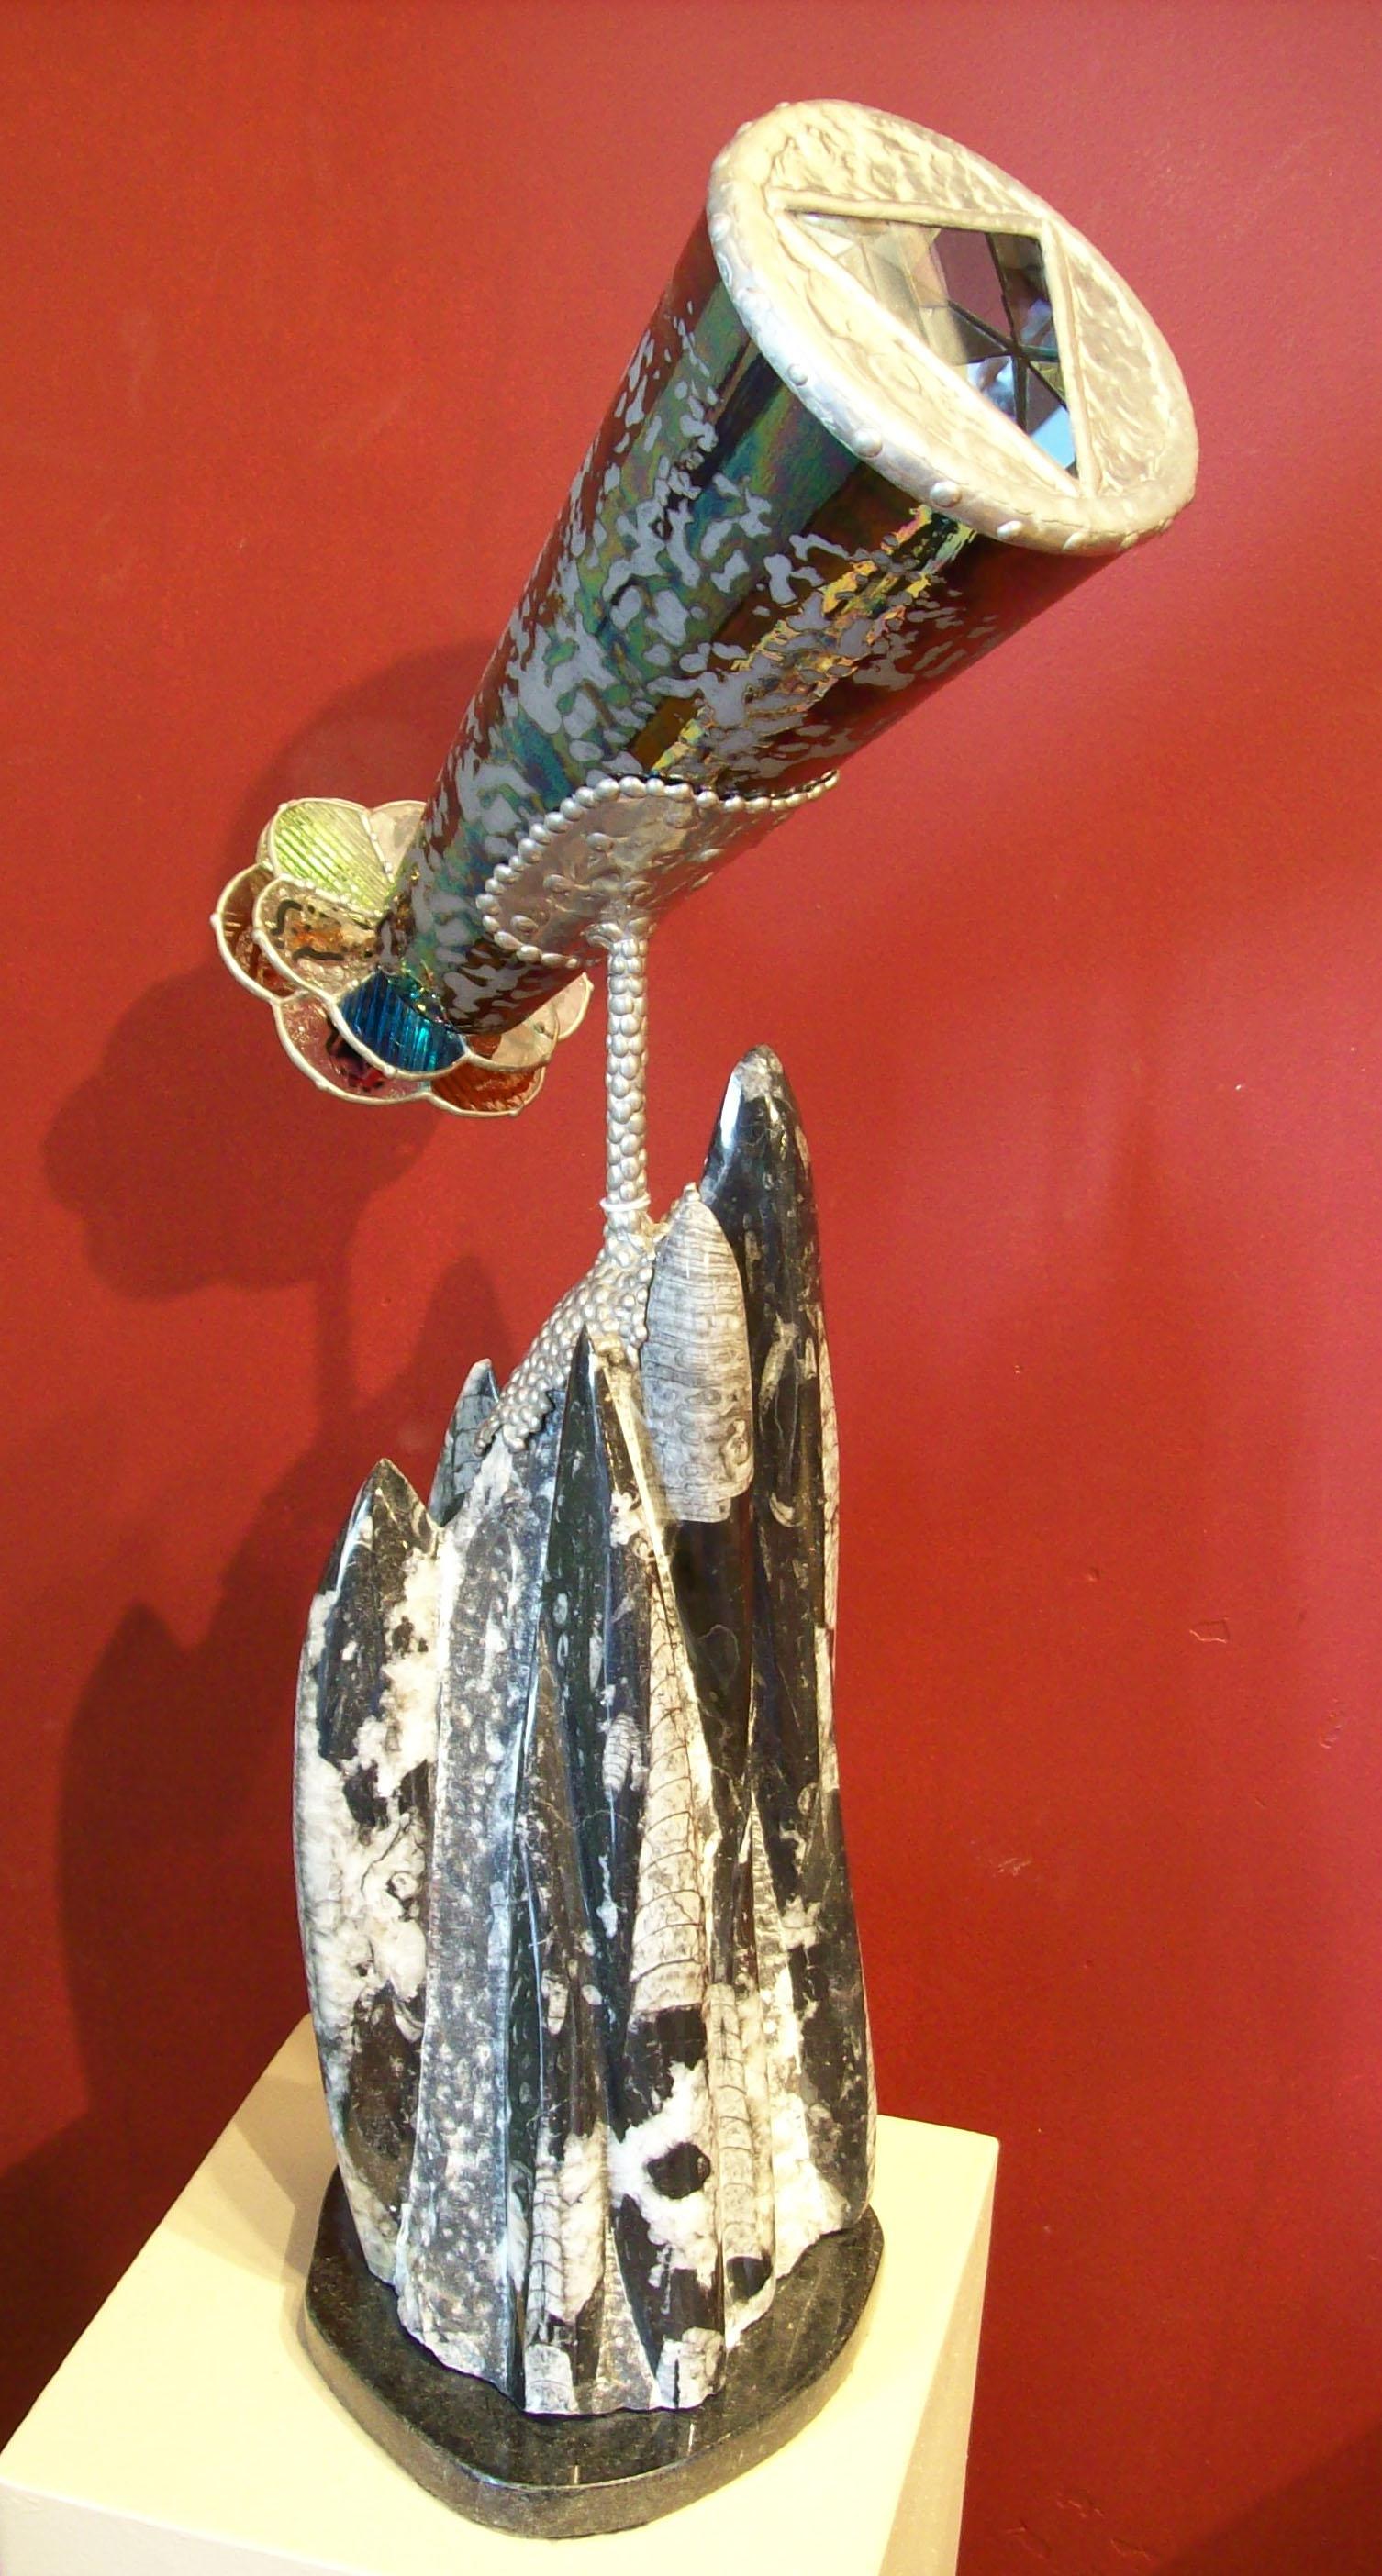 83 Ortho w-Granite Ba... by  Steve Failows - Masterpiece Online